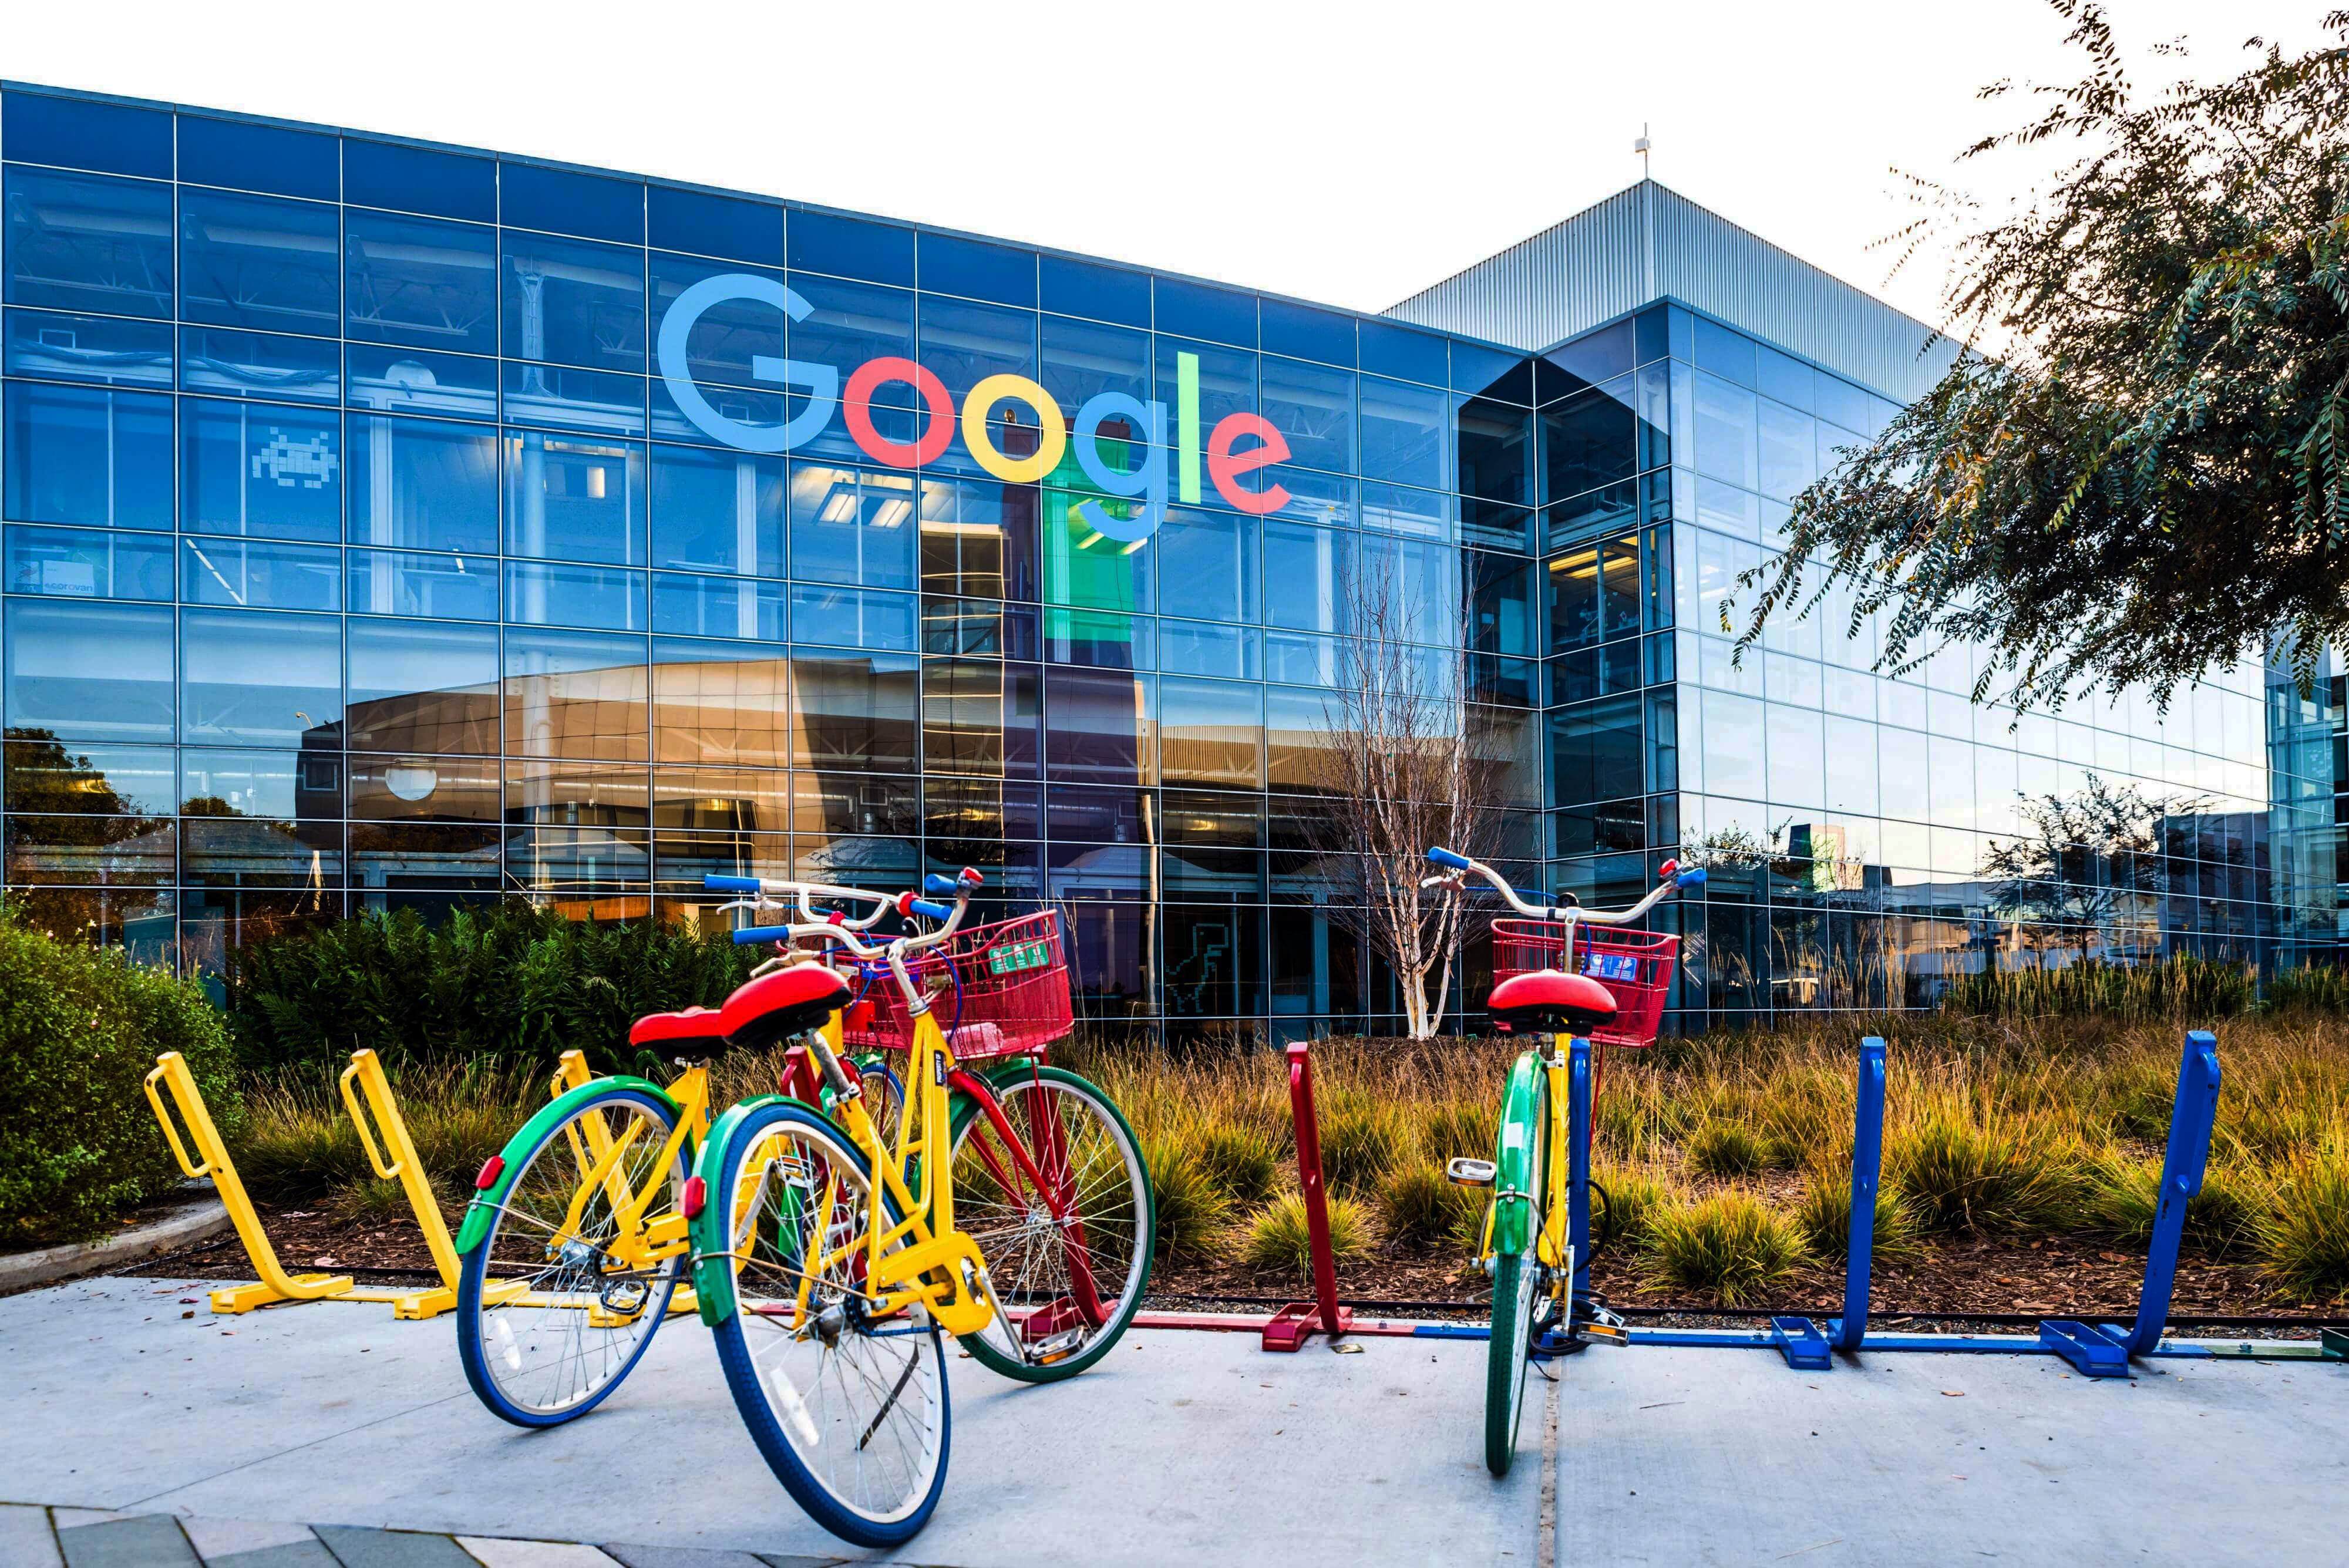 google_googleplex_silicon-valley-tiny-2